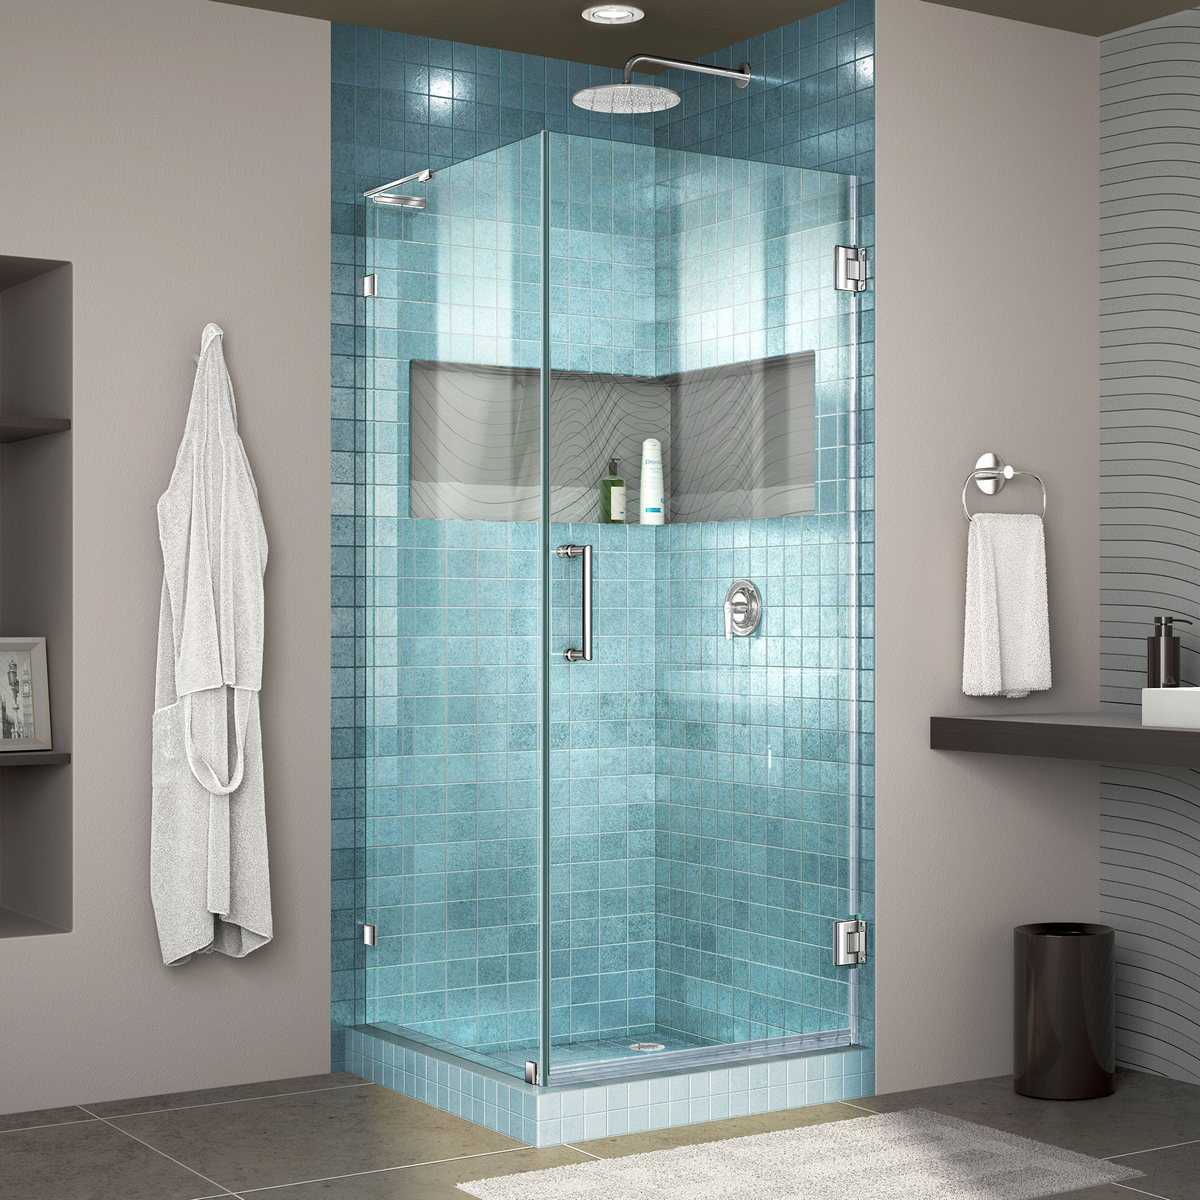 Dreamline Lux Frameless Hinged Shower Enclosure Bar Chrome